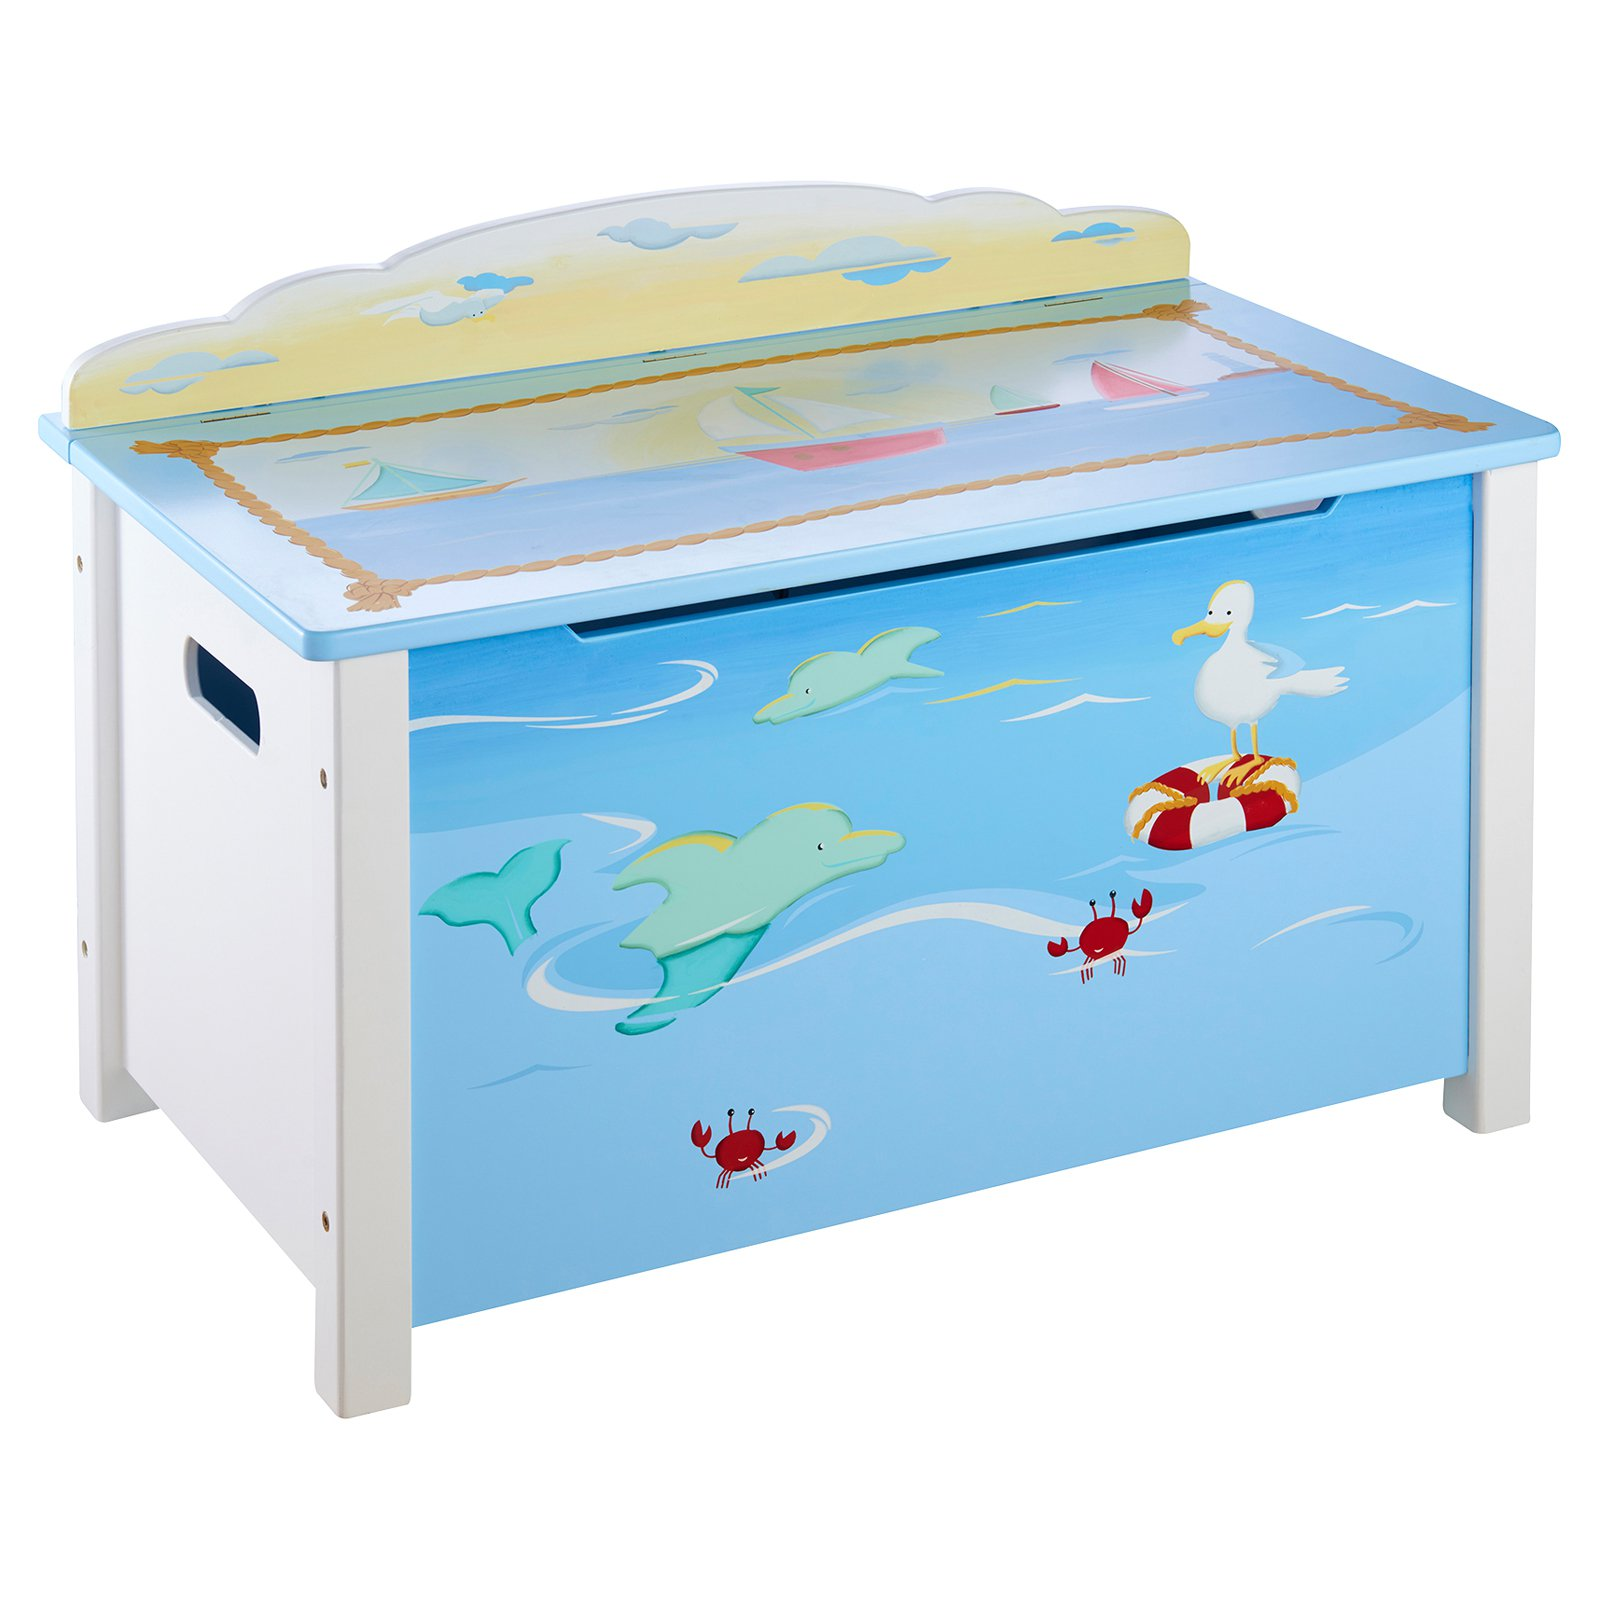 Guidecraft Sailing Toy Box